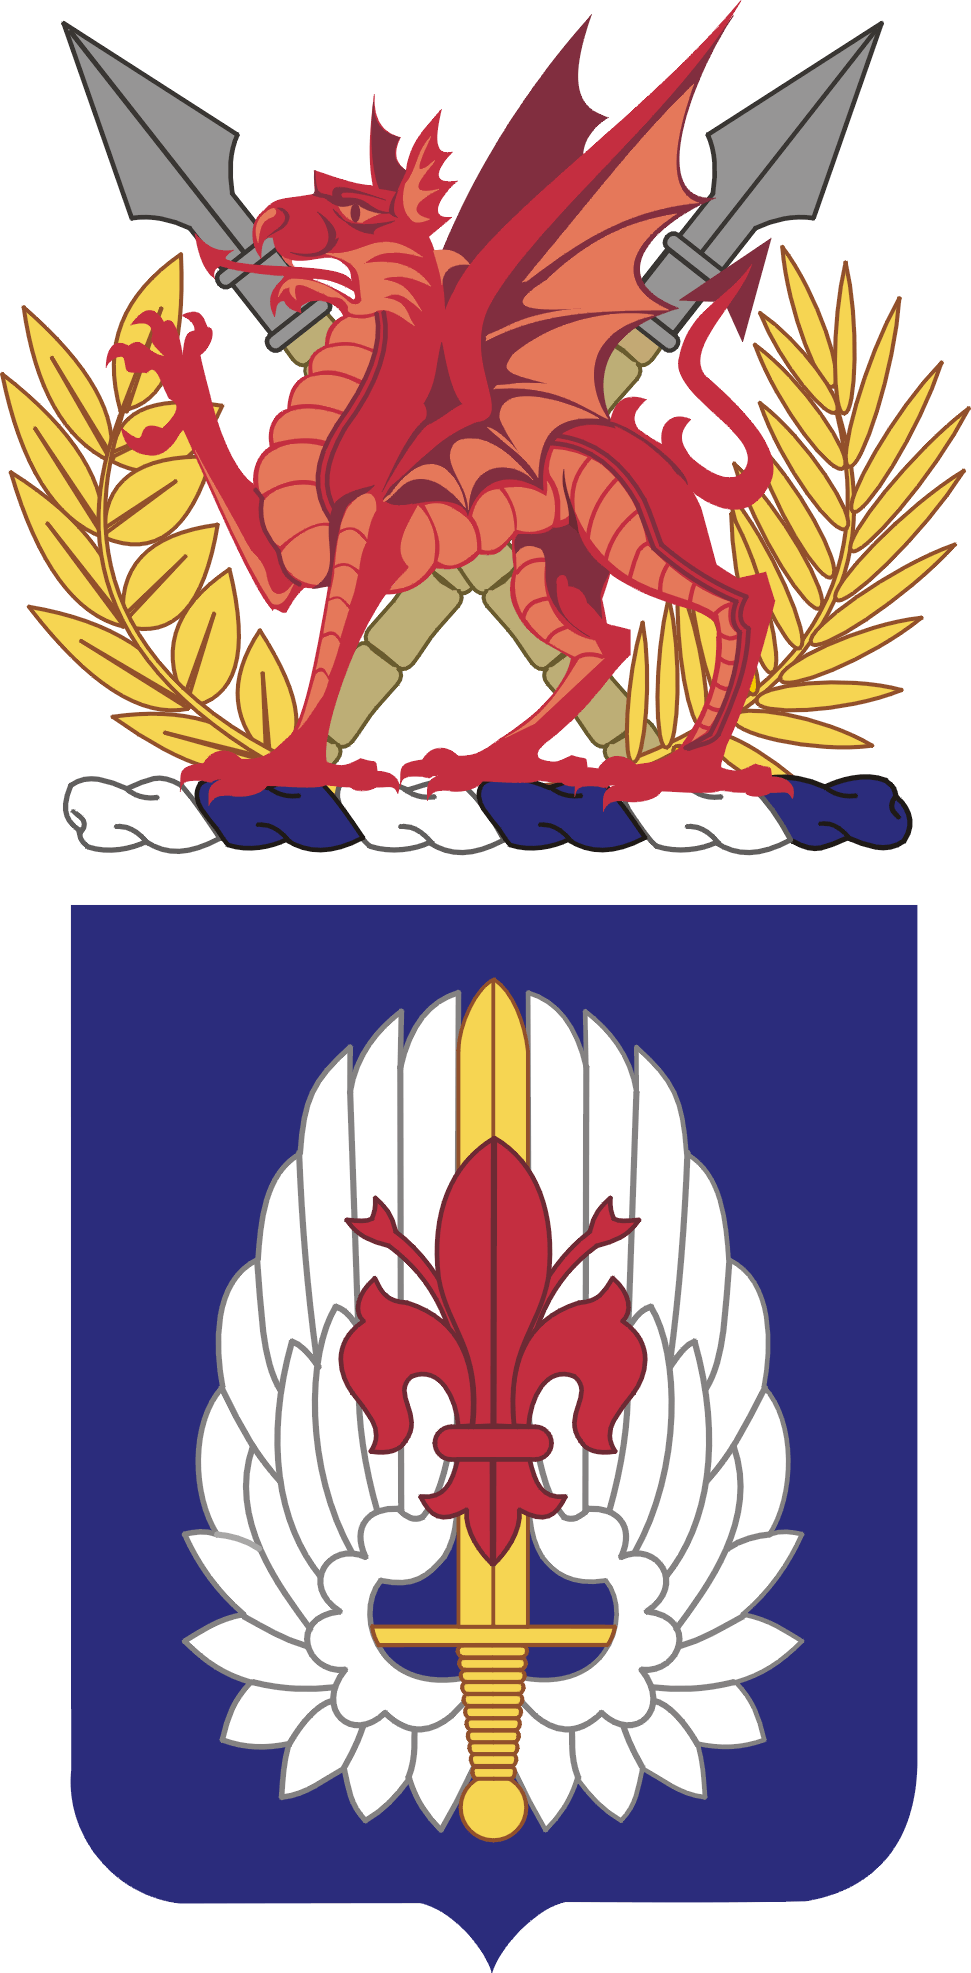 52nd Aviation Regiment (United States) - Wikipedia